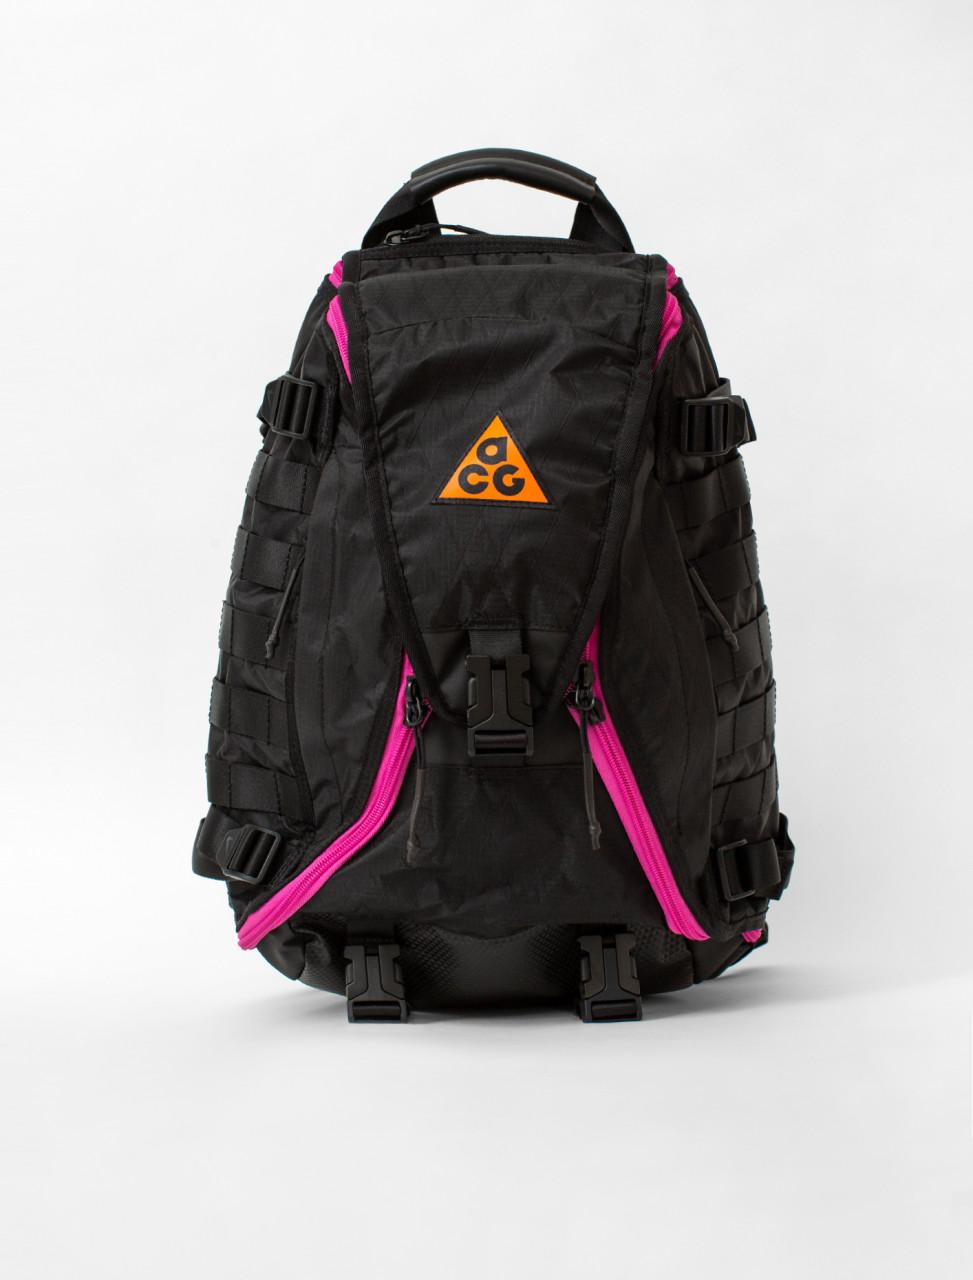 ACG Responder Backpack